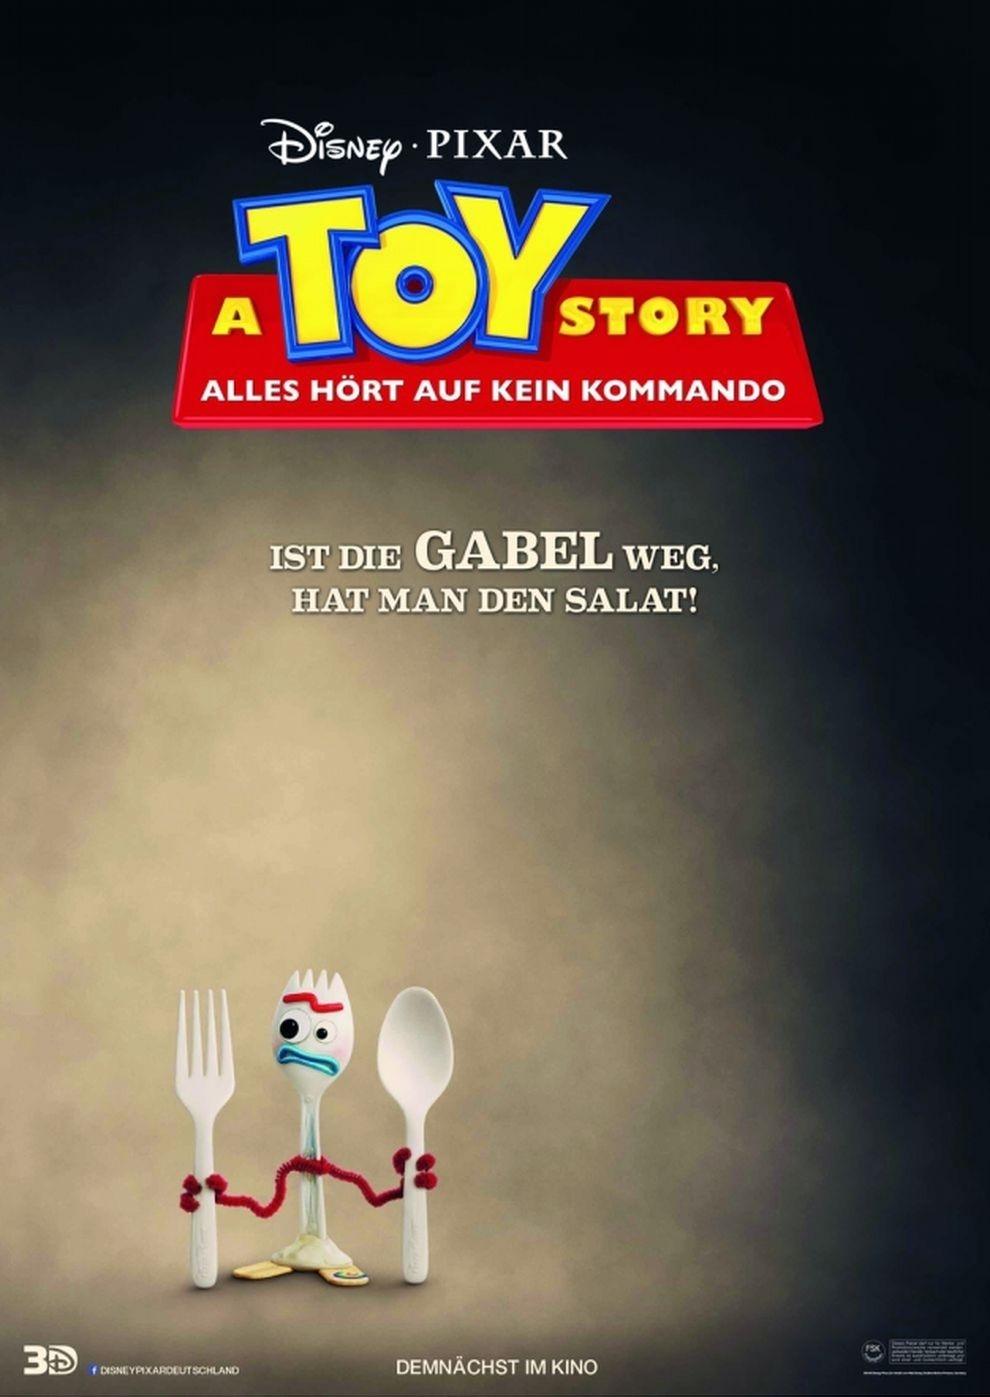 A Toy Story: Alles hört auf kein Kommando (Poster)